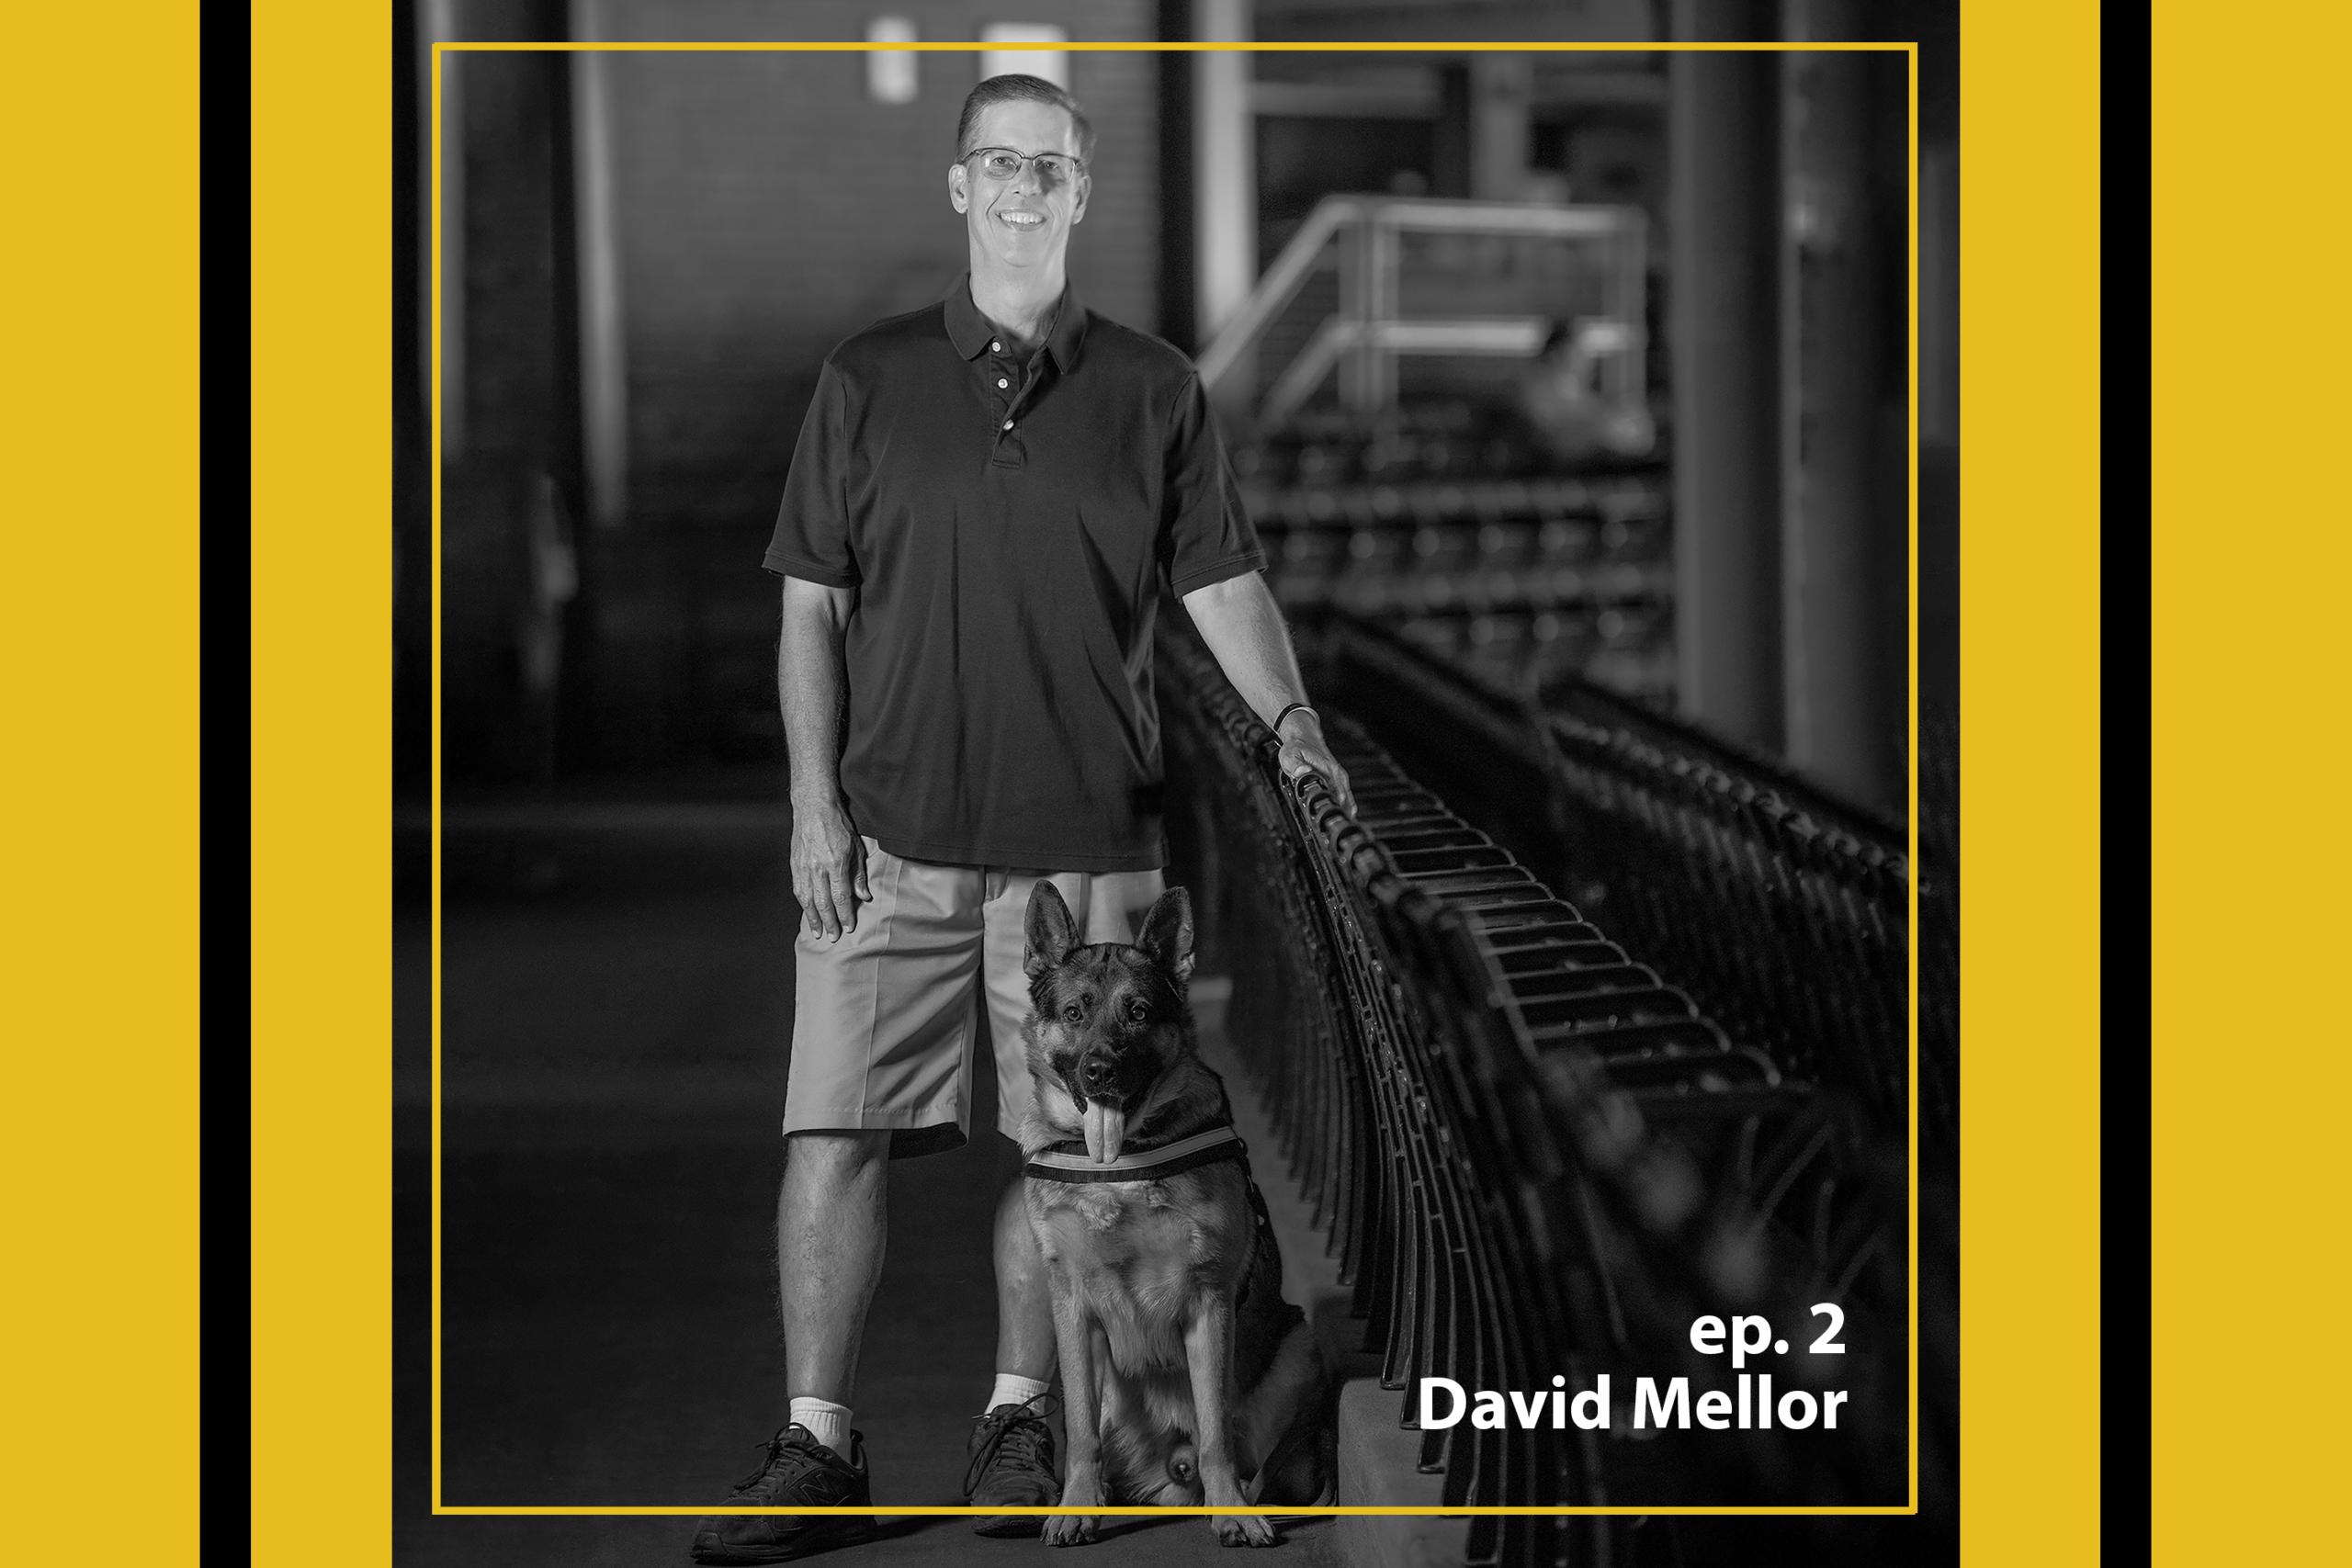 David Mellor - Back From Broken Episode 2